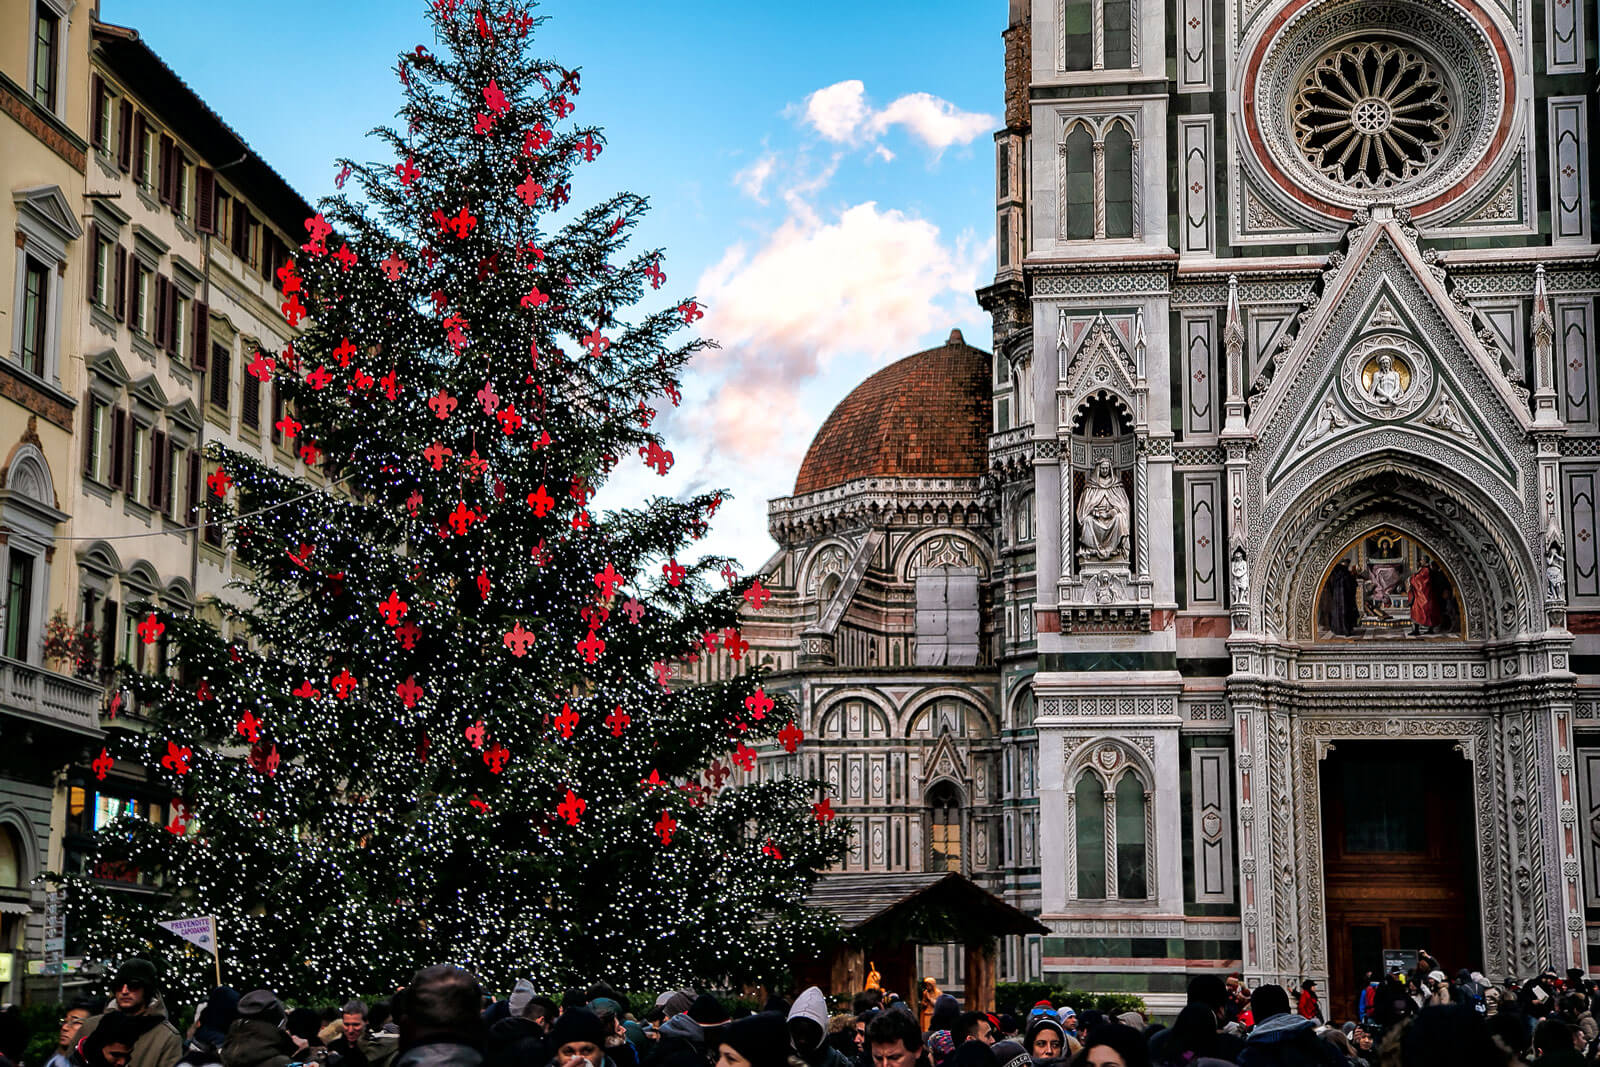 2021/01/Advent-Toskana-4.jpg